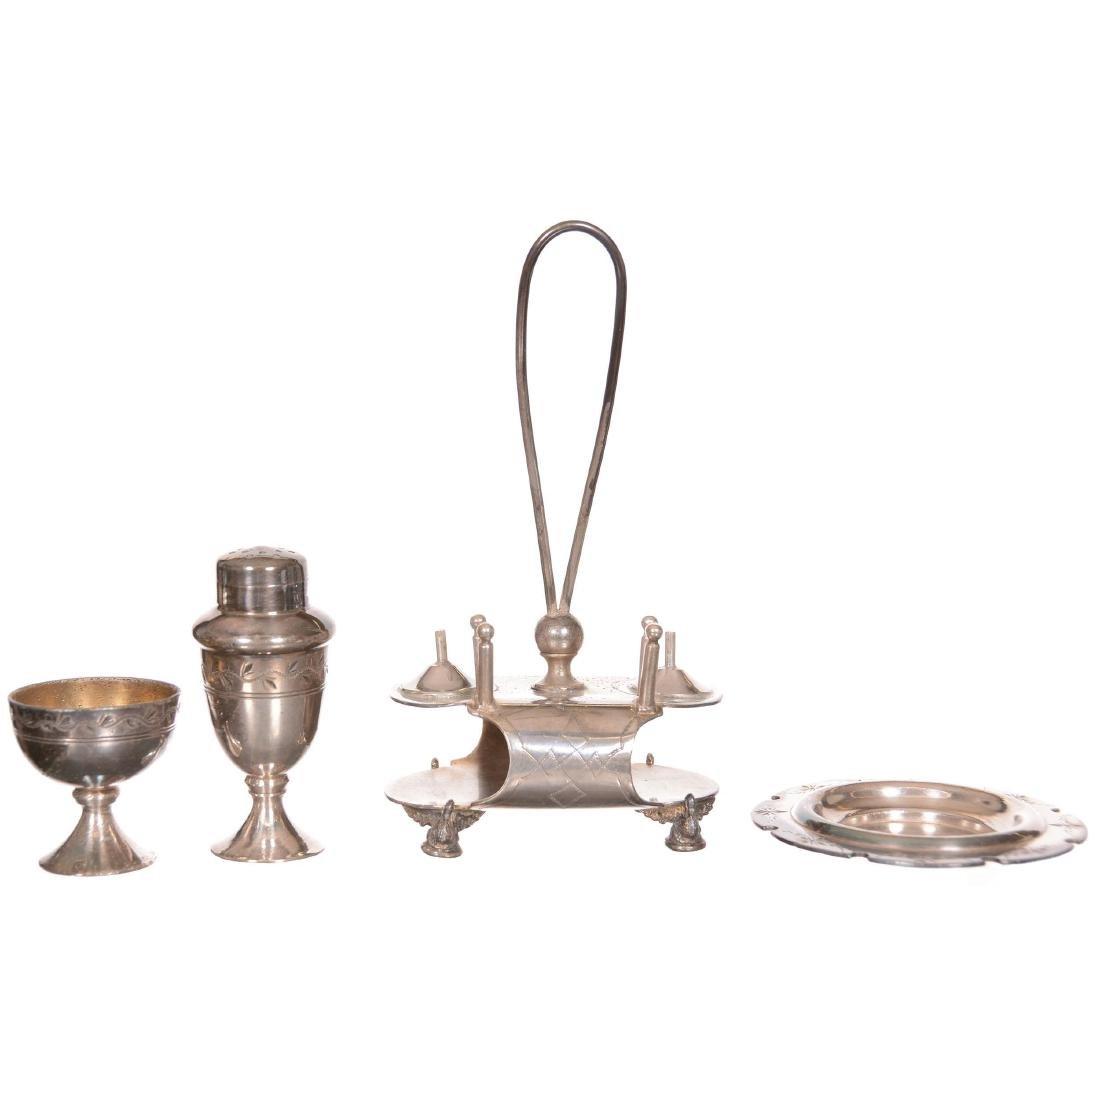 Victorian Condiment Set - 2